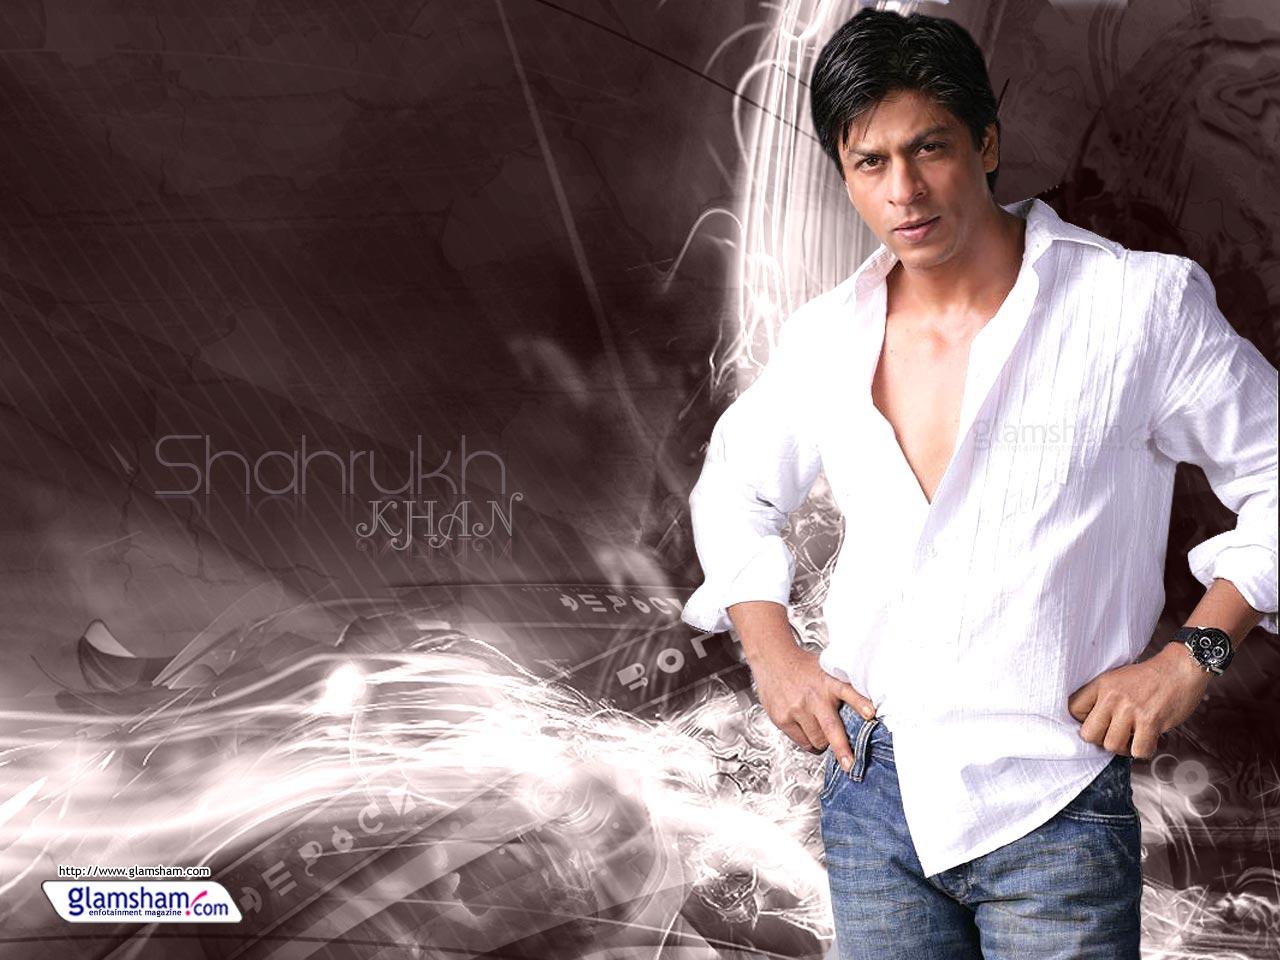 Shahrukh Khan Wallpapers: Shahrukh Khan HD Wallpapers Free Download